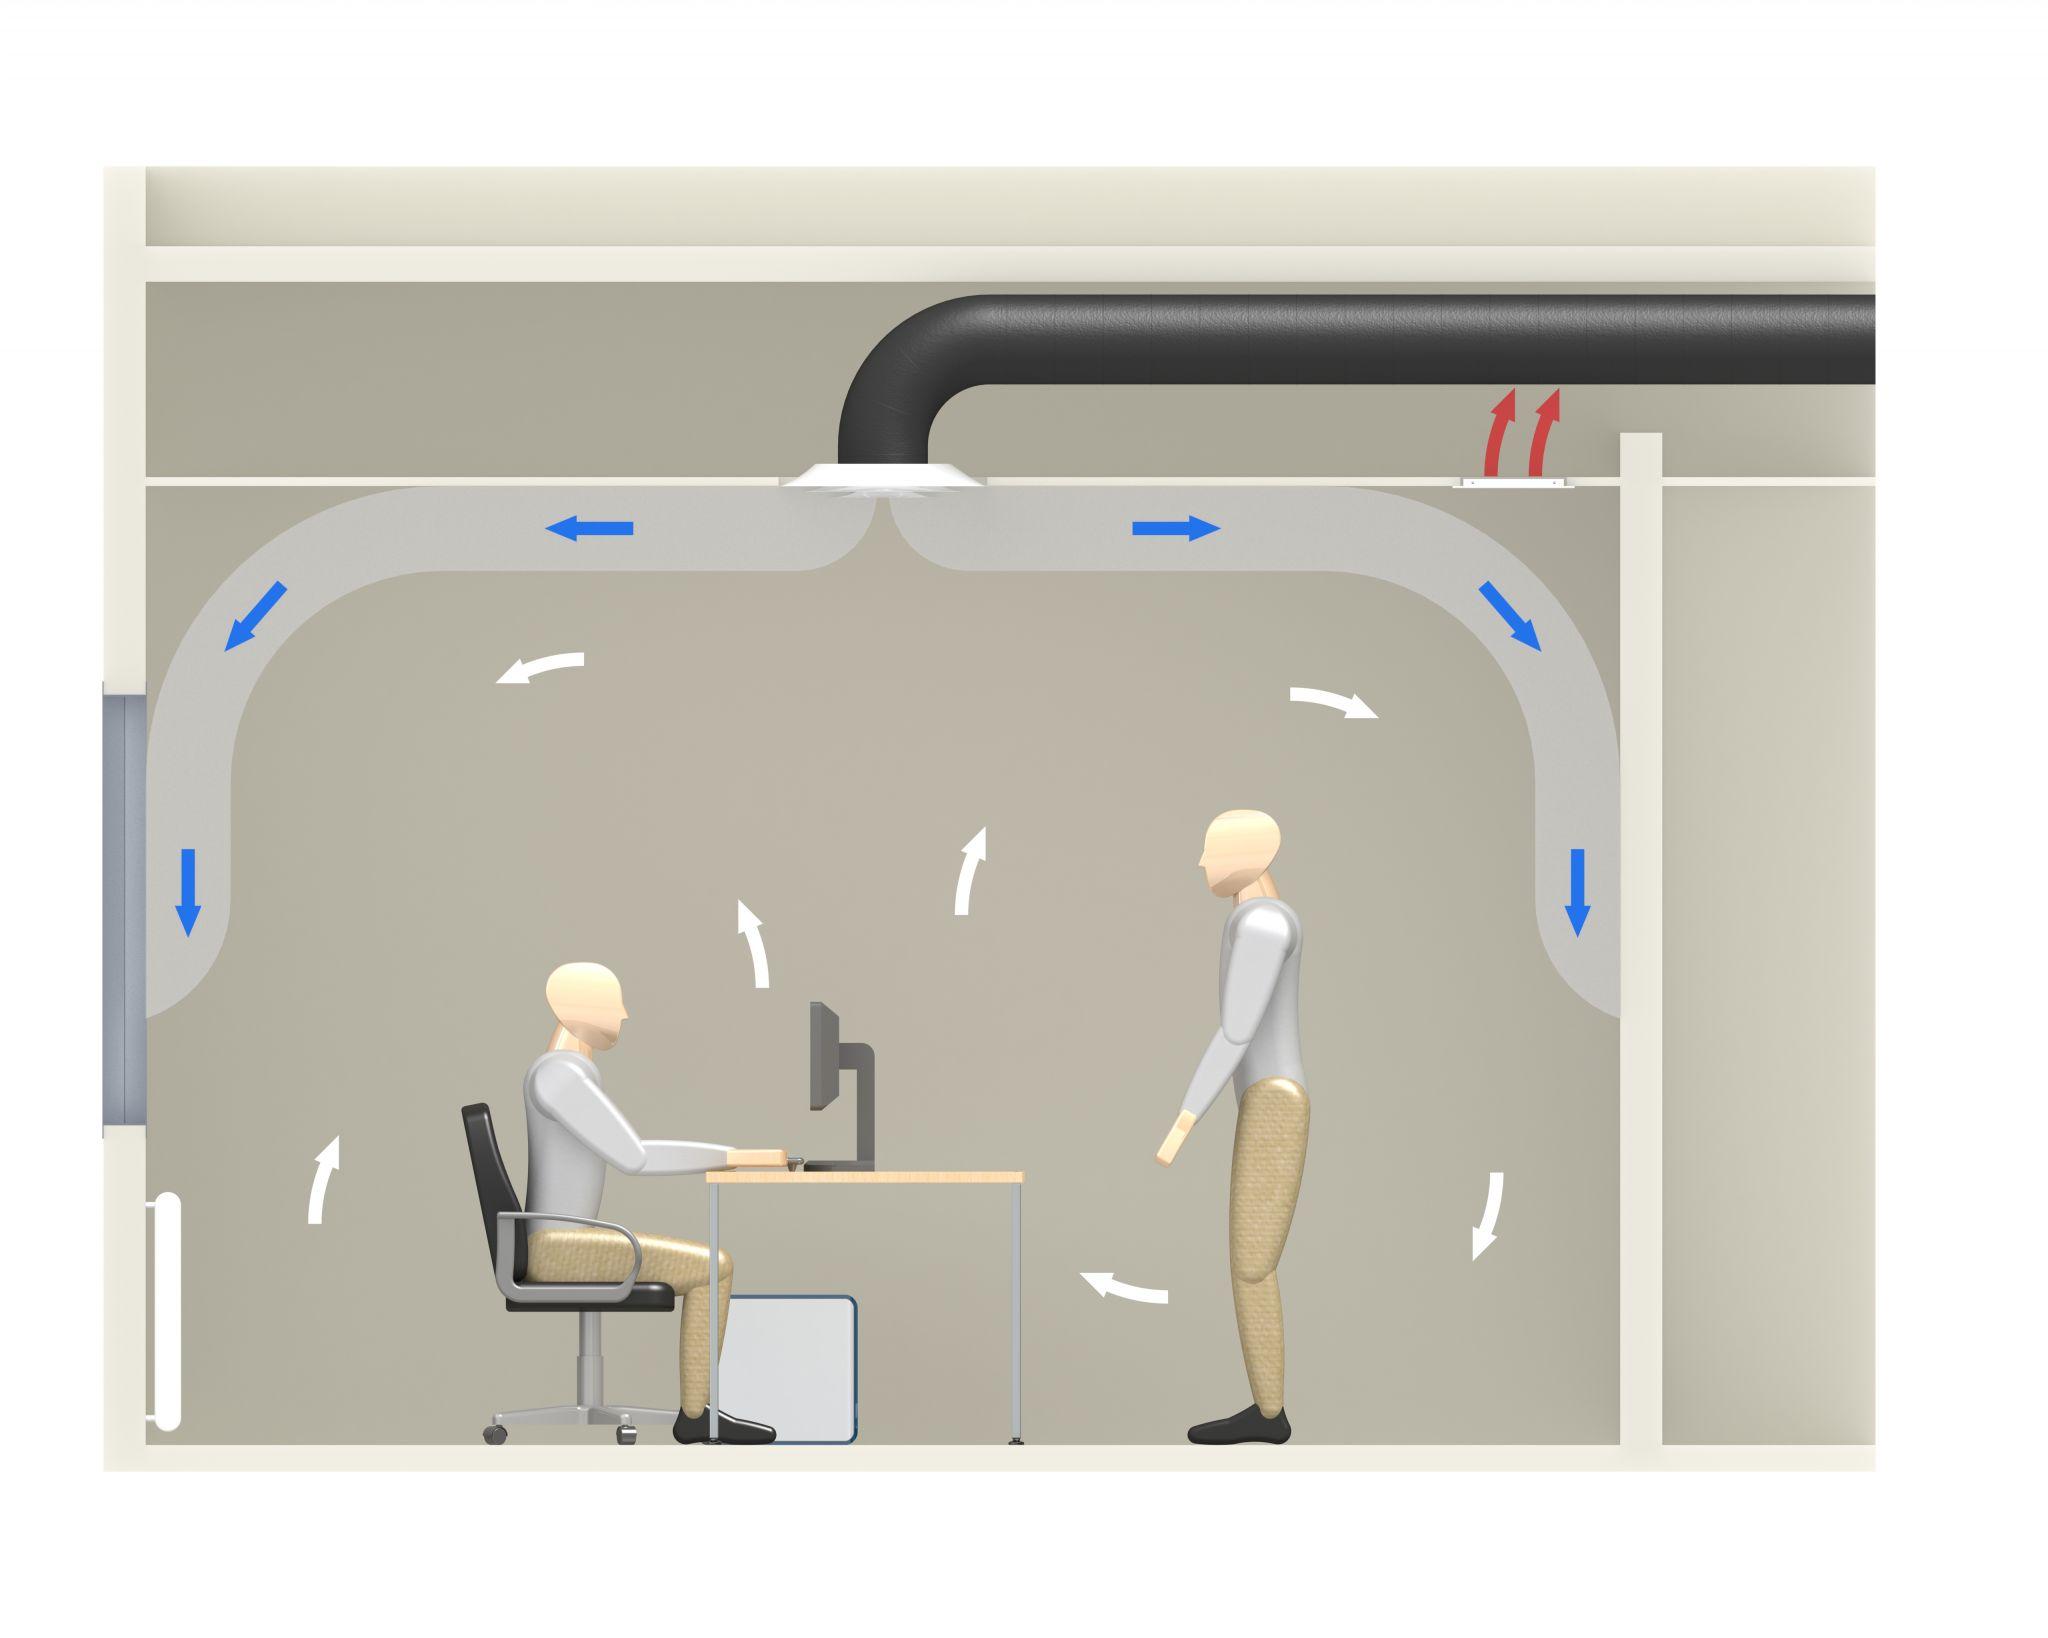 air distribution system design pdf